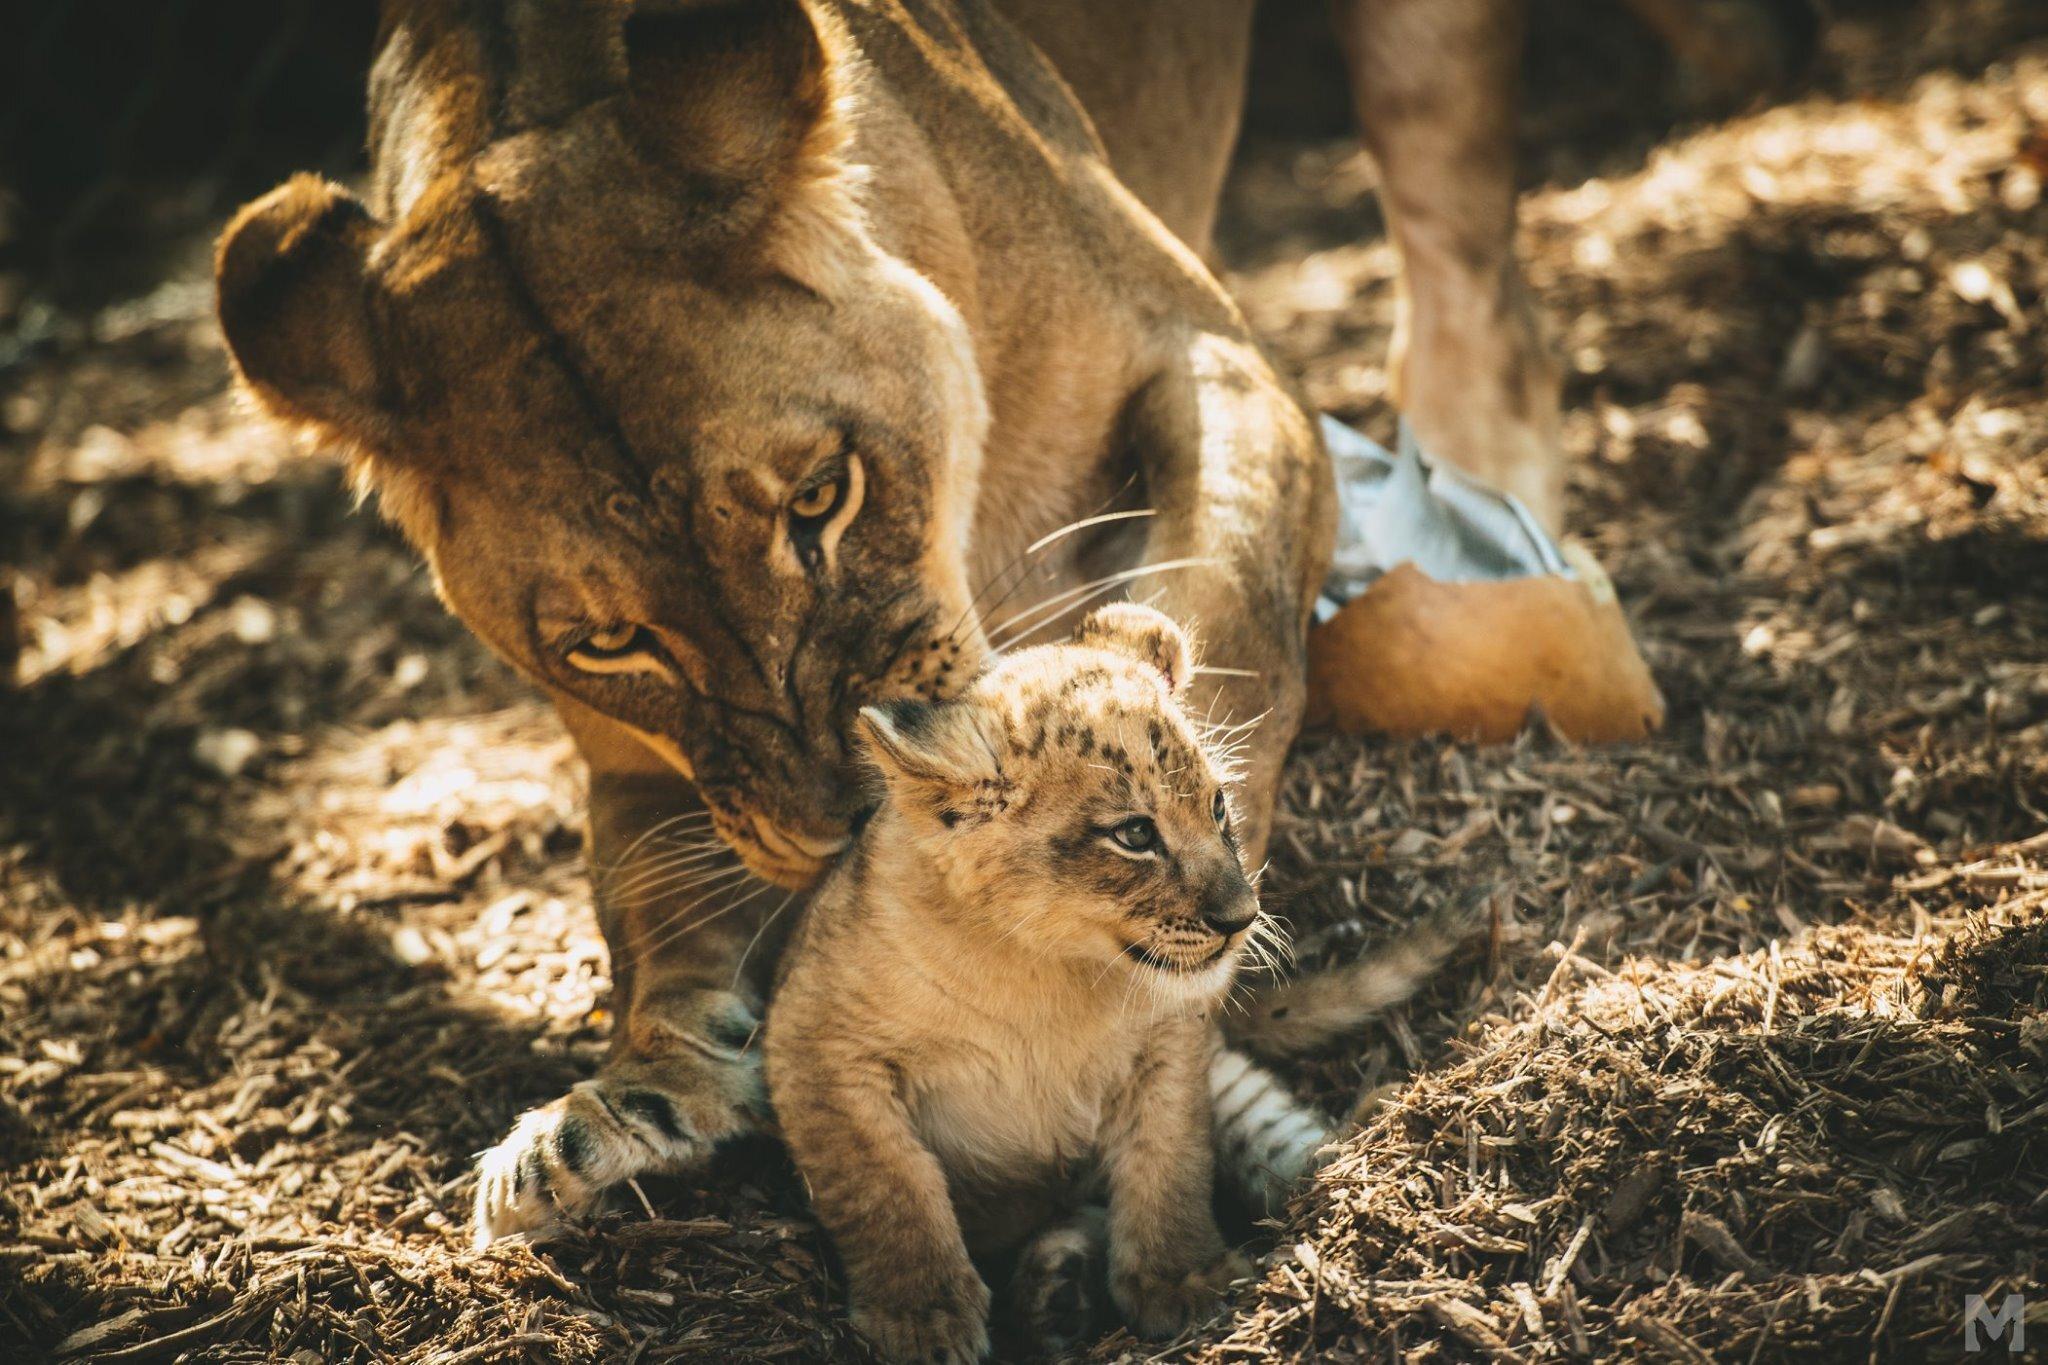 Lion Cub_4_Molly McCormick.jpg